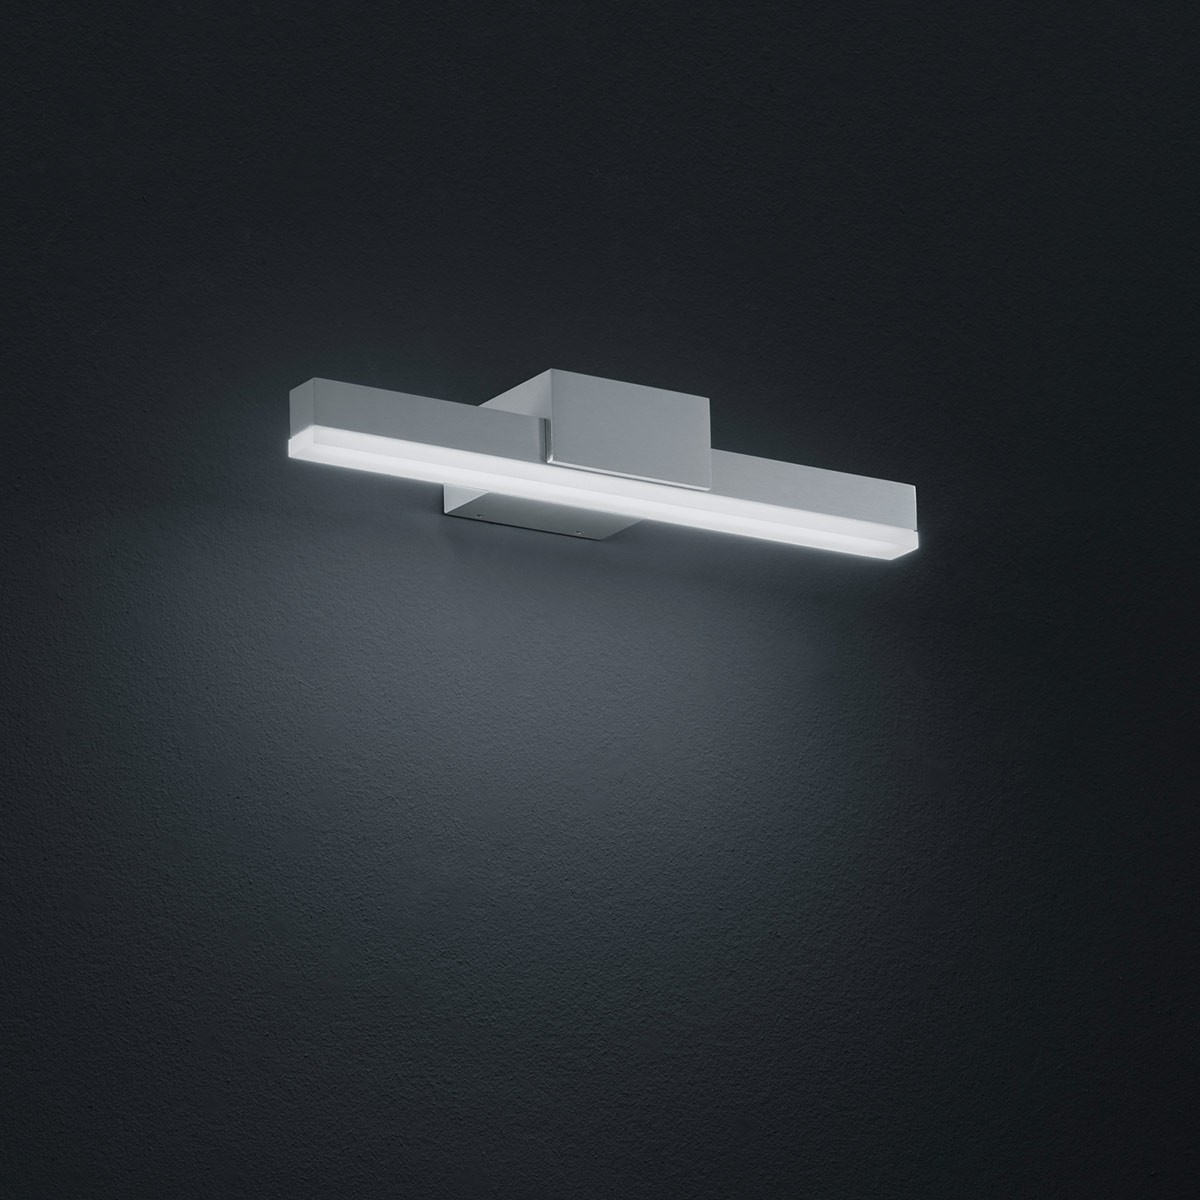 Helestra Ivy LED Wandleuchte, Breite: 30 cm, Aluminium matt